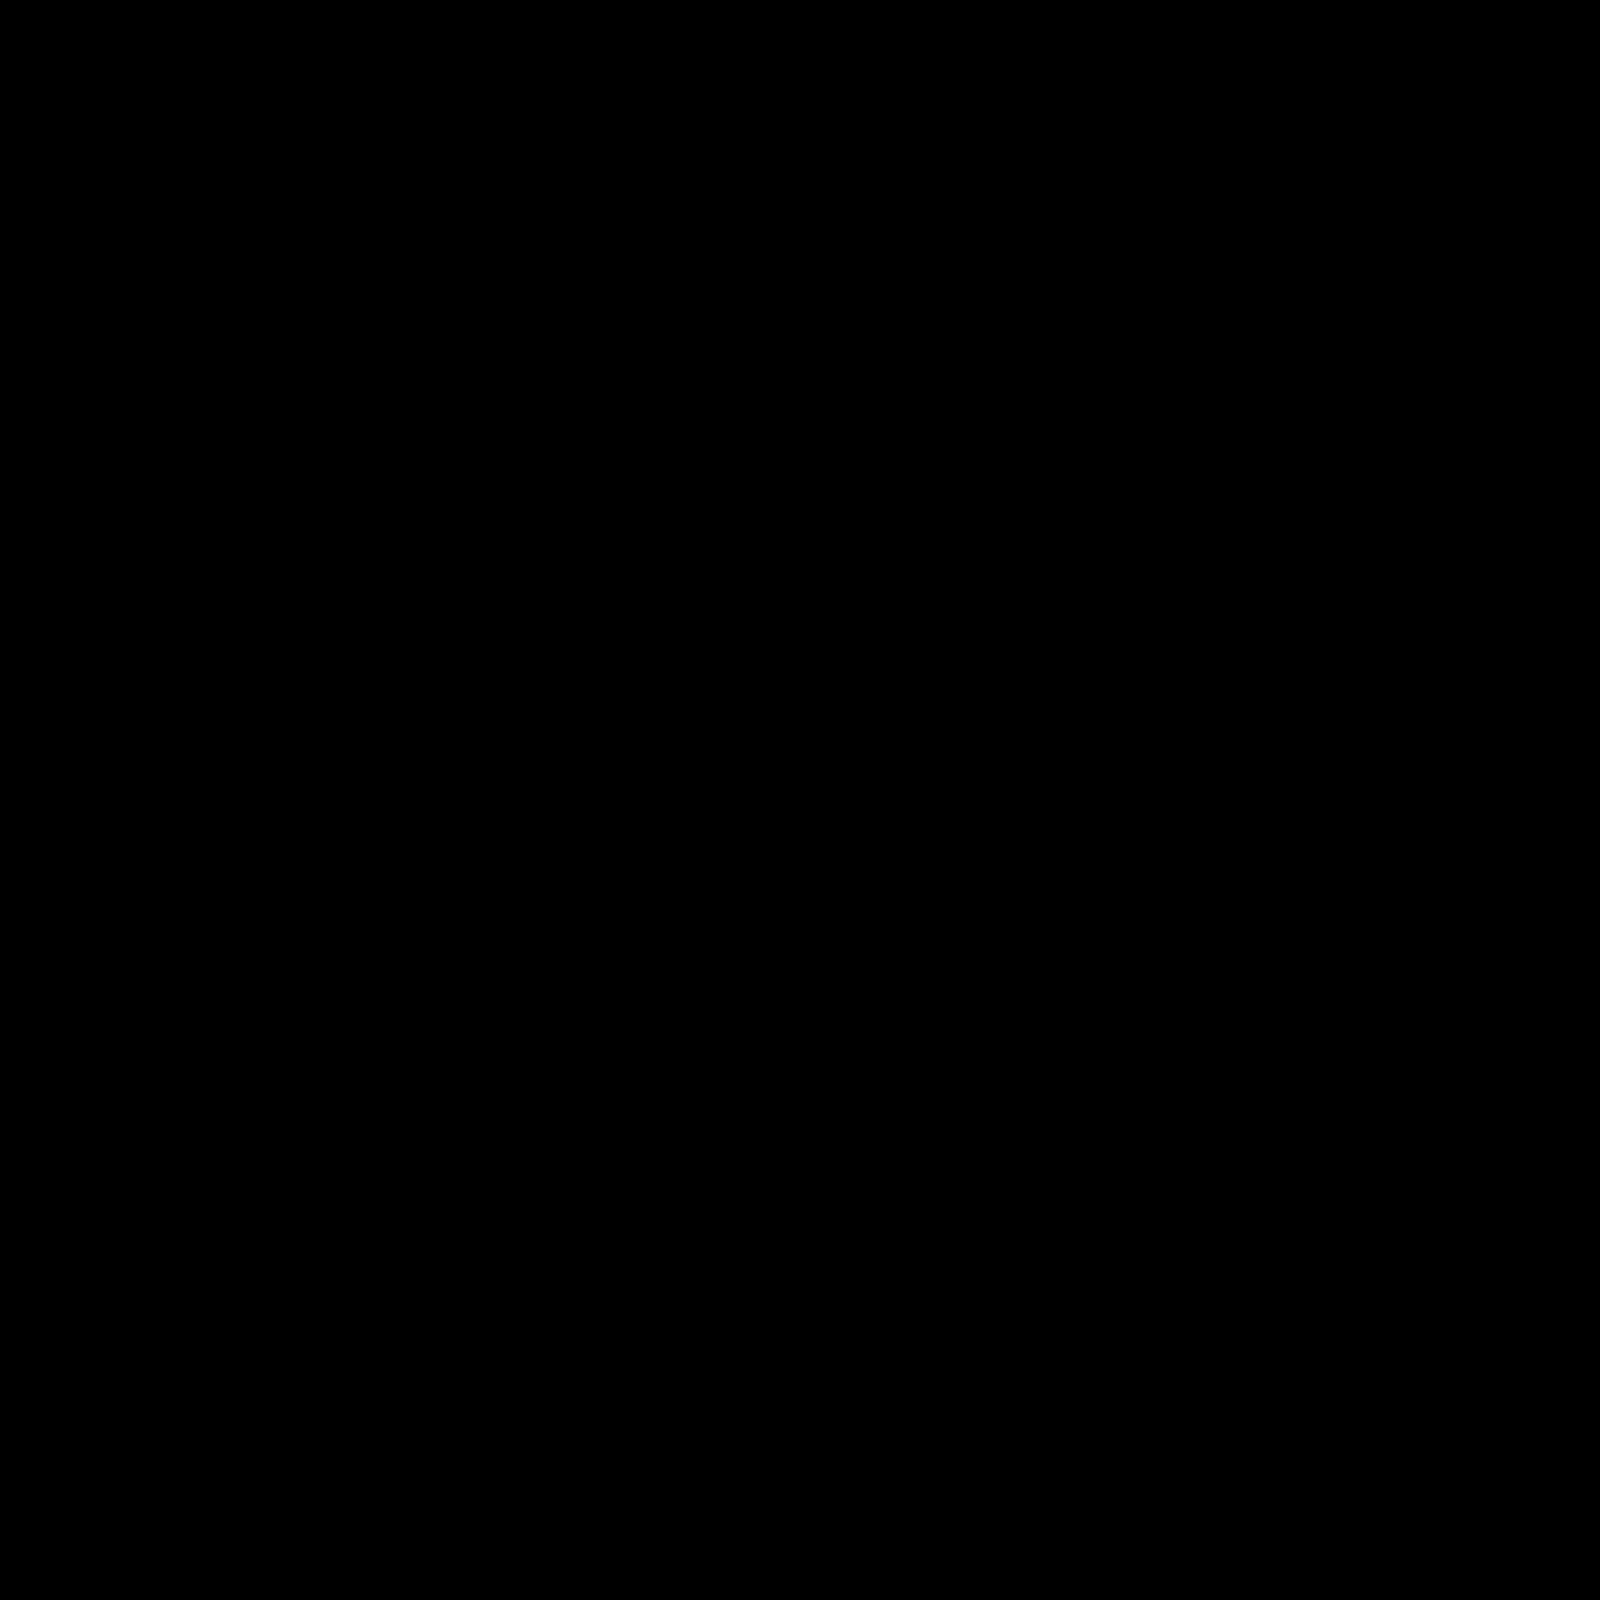 Van Filled icon